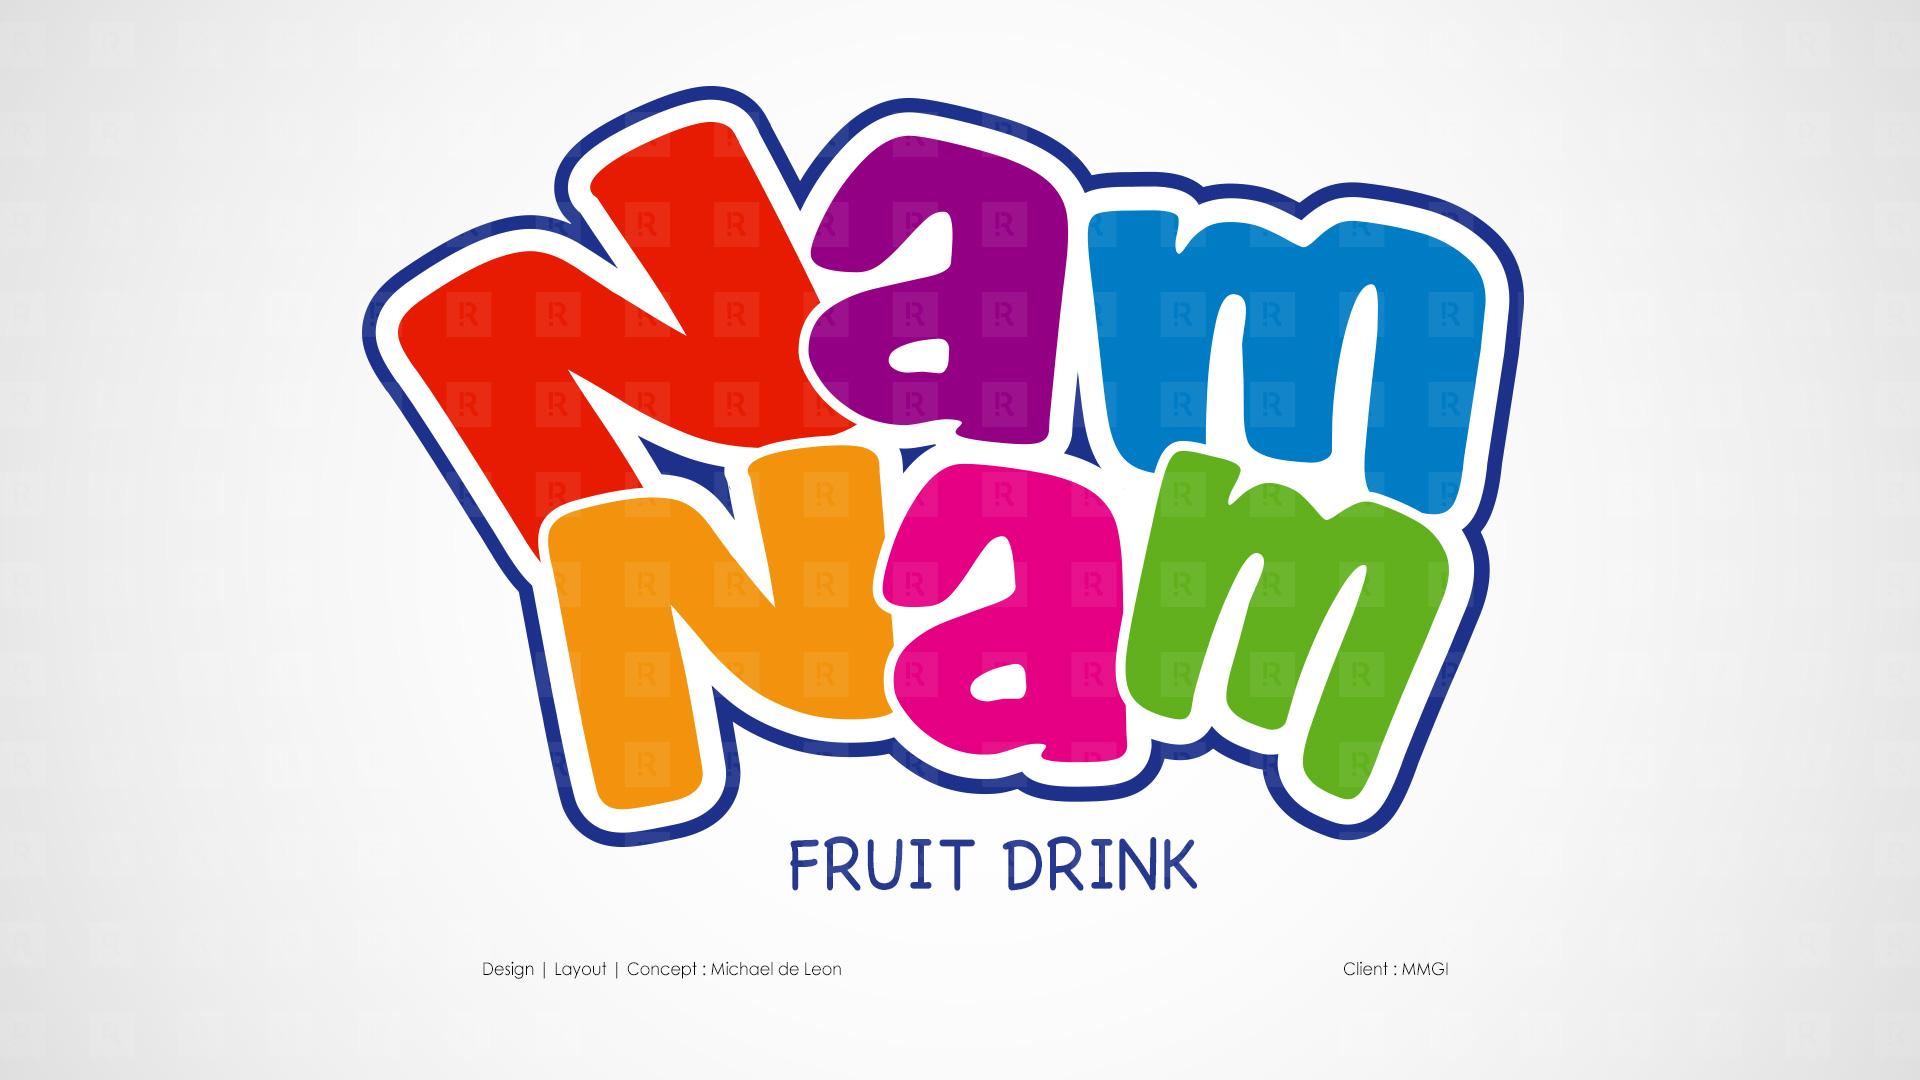 Nam Nam Fruit Drink Concept | Layout | Final Artwork | Packaging | Character Design